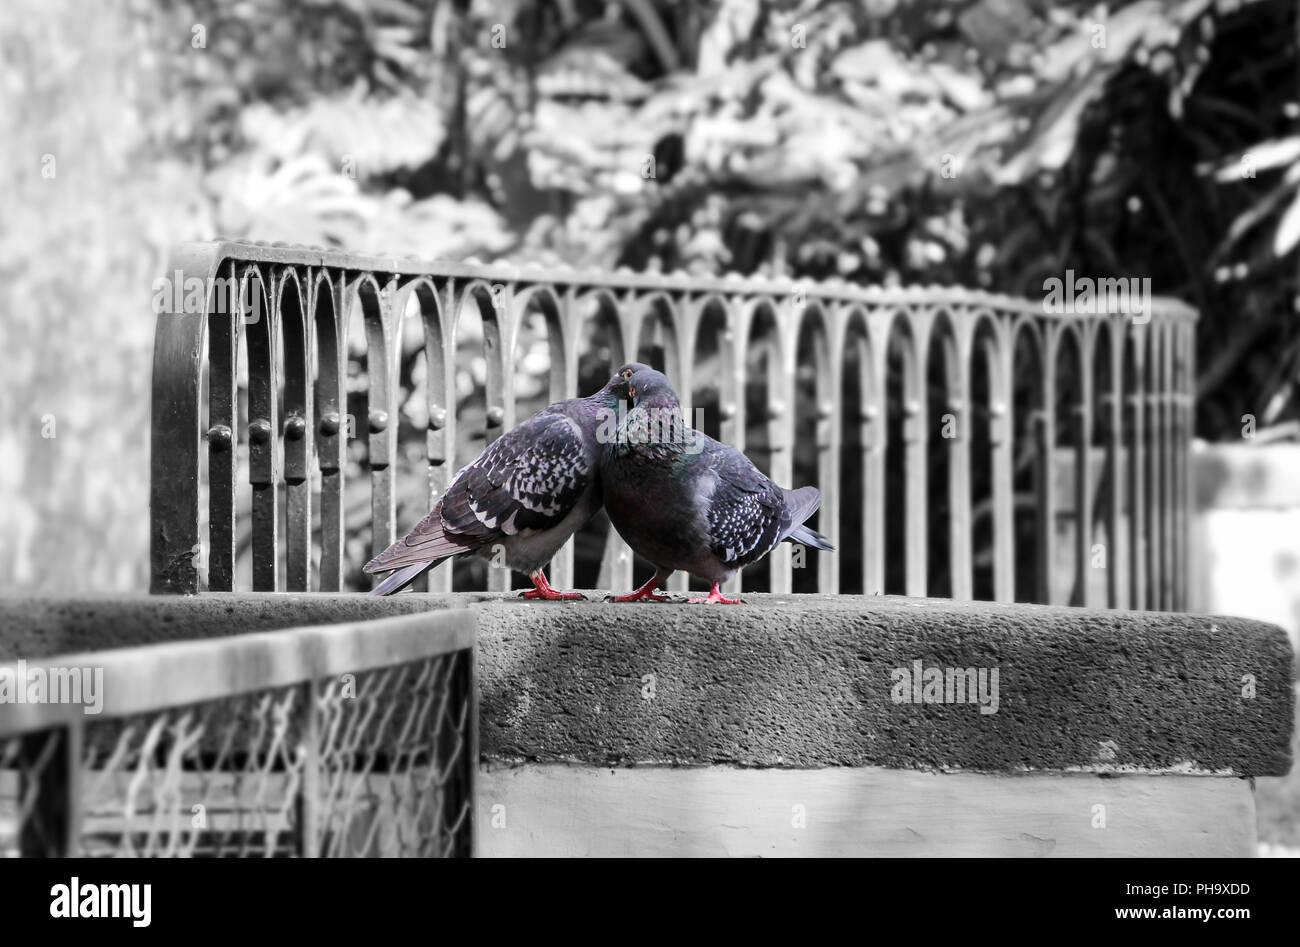 Turtle doves, affection, fidelity, birds - Stock Image